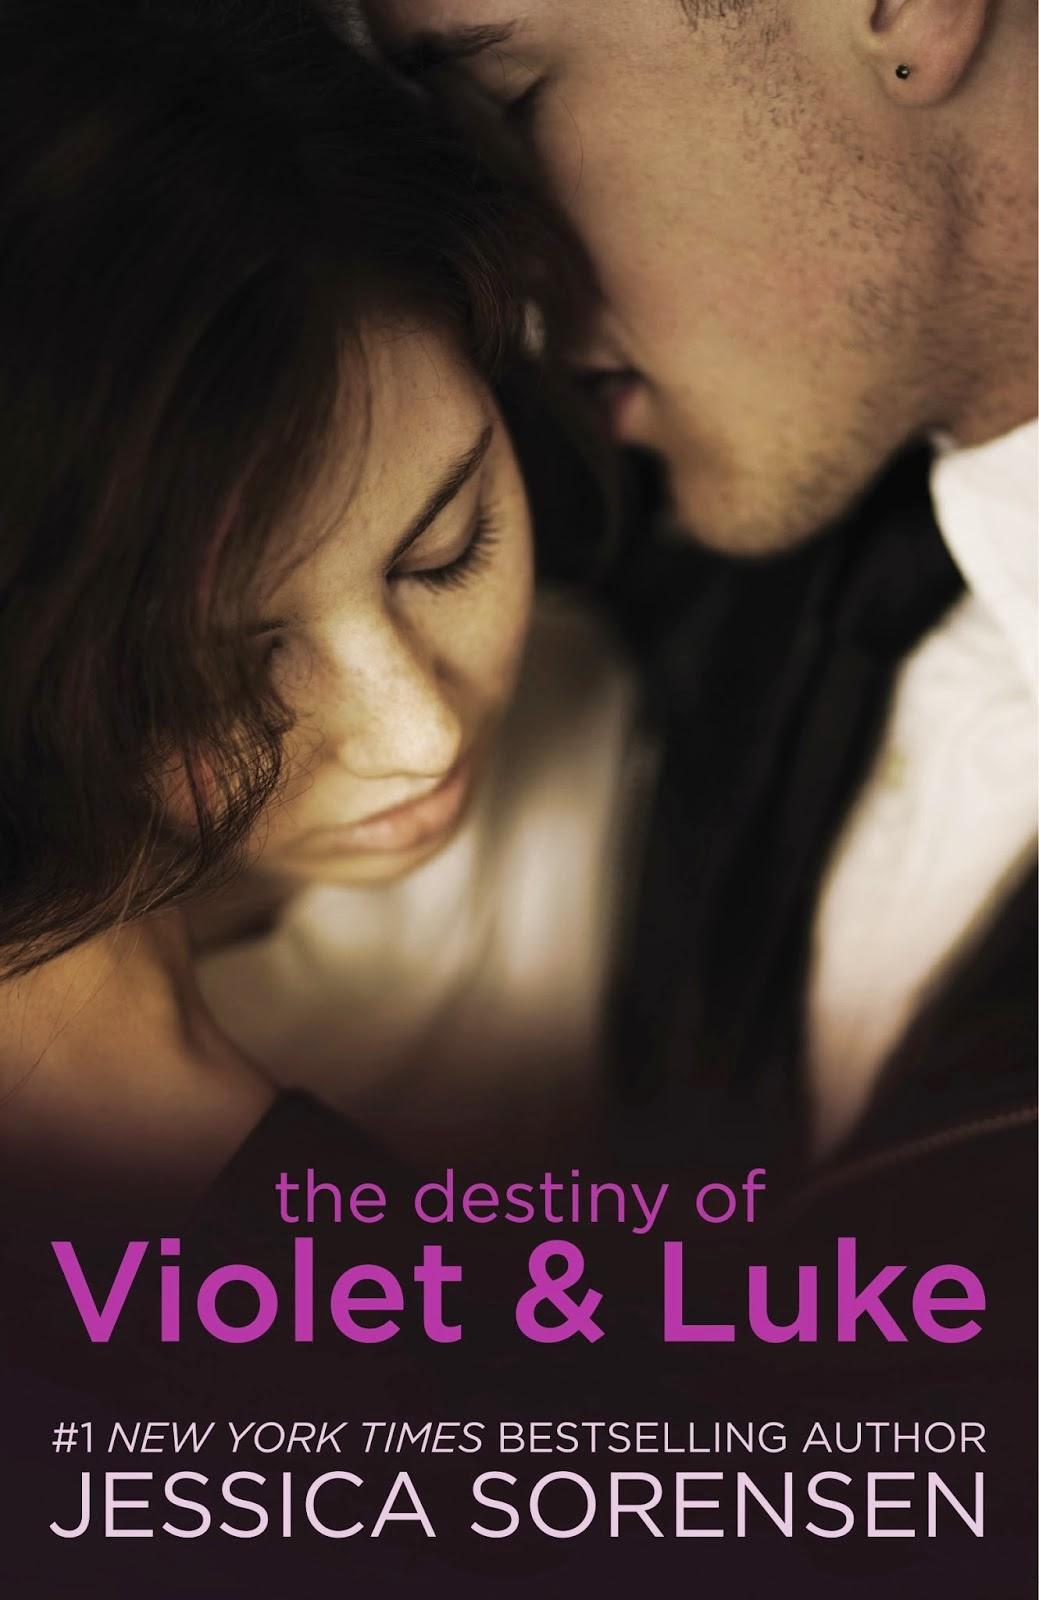 Serie The Coincidence - The Destiny of Violet & Luke #3 de Jessica Sorensen